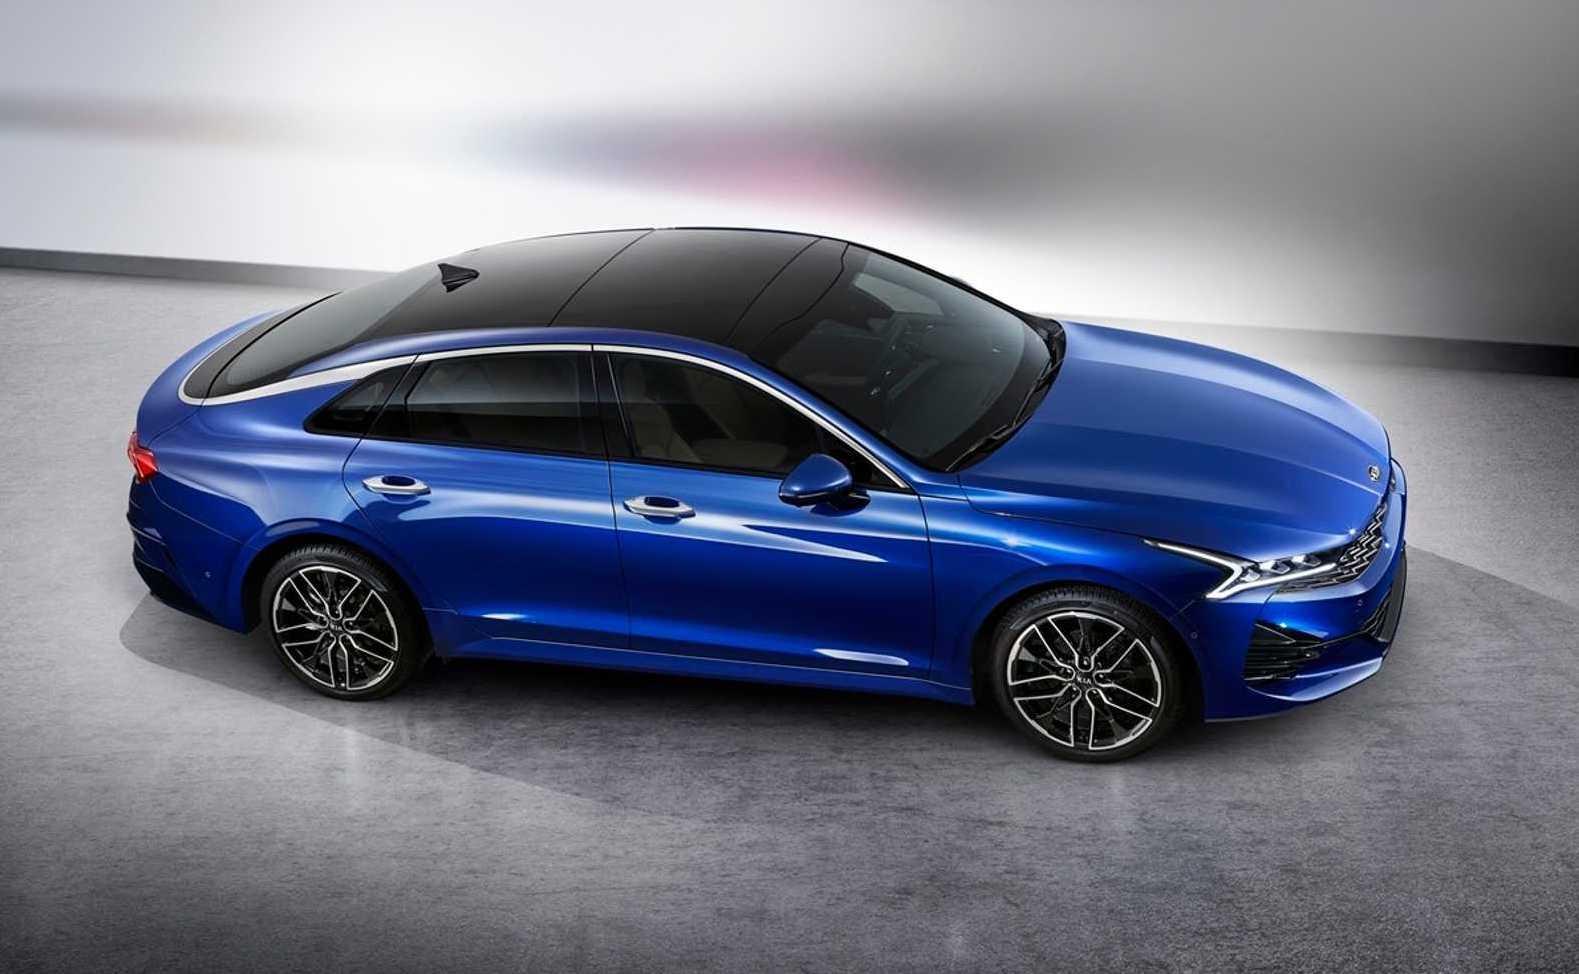 Kia debuts Hyundai's new 2.5 T-GDi turbo engine, 8-speed dual-clutch auto